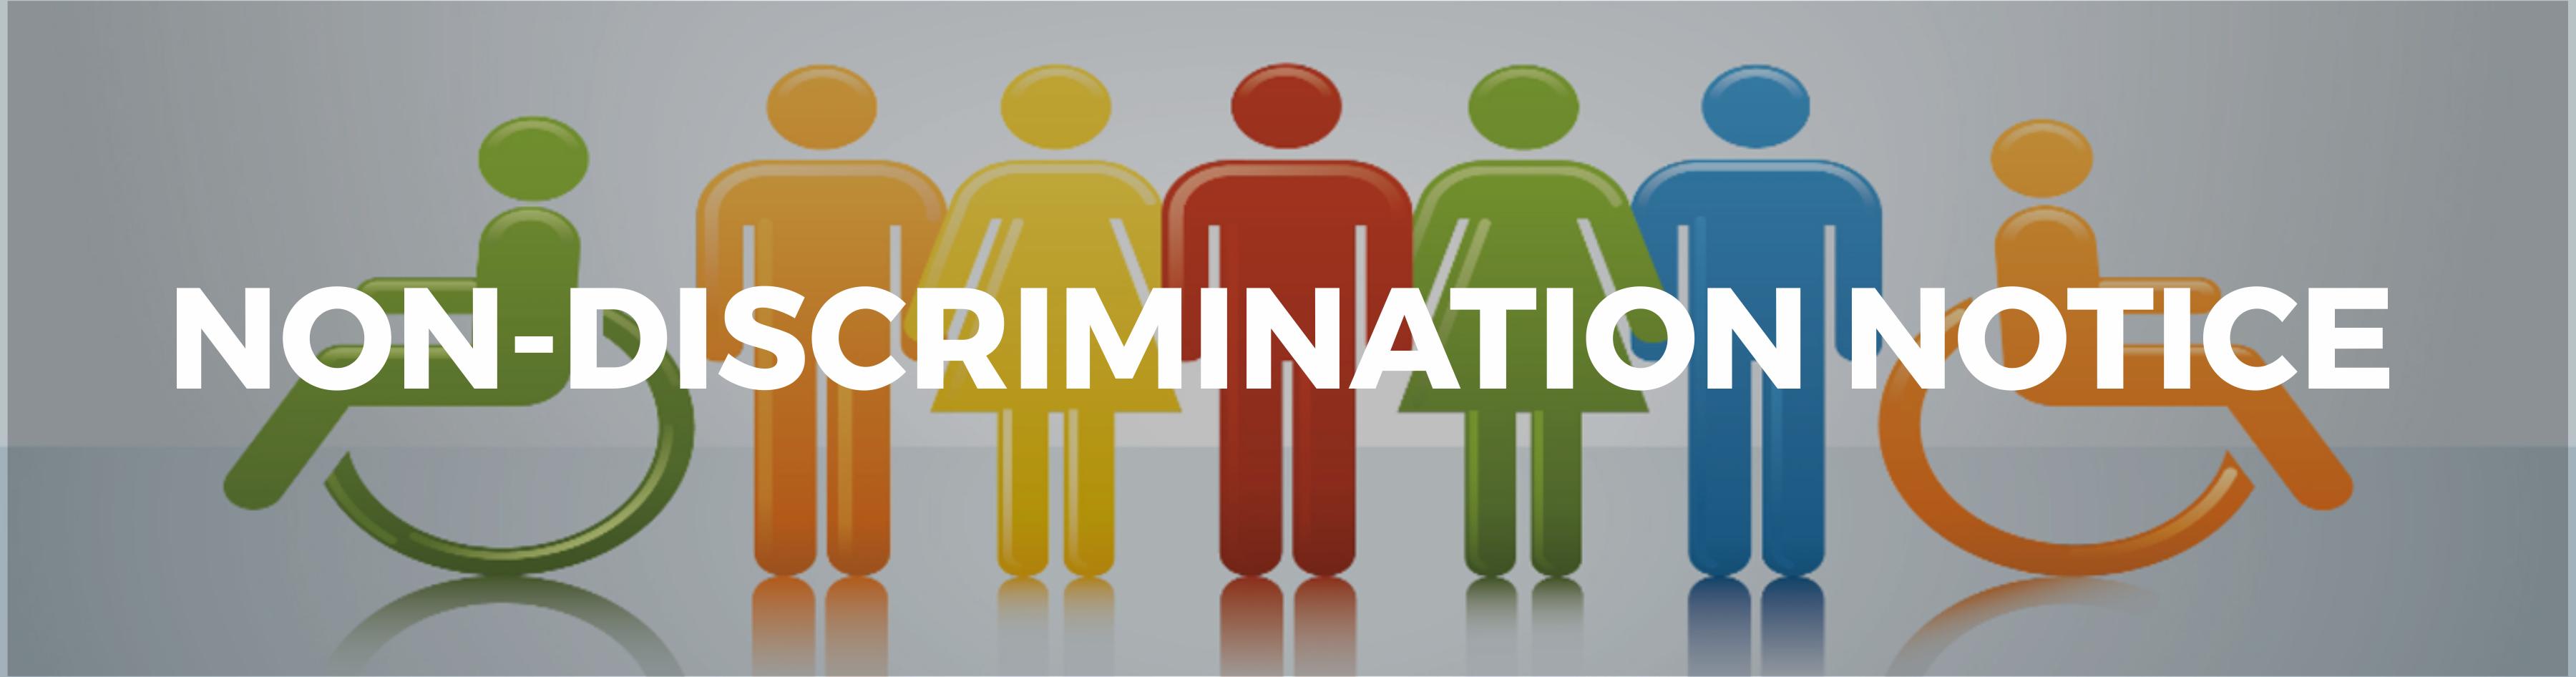 Non Discrimination Notice